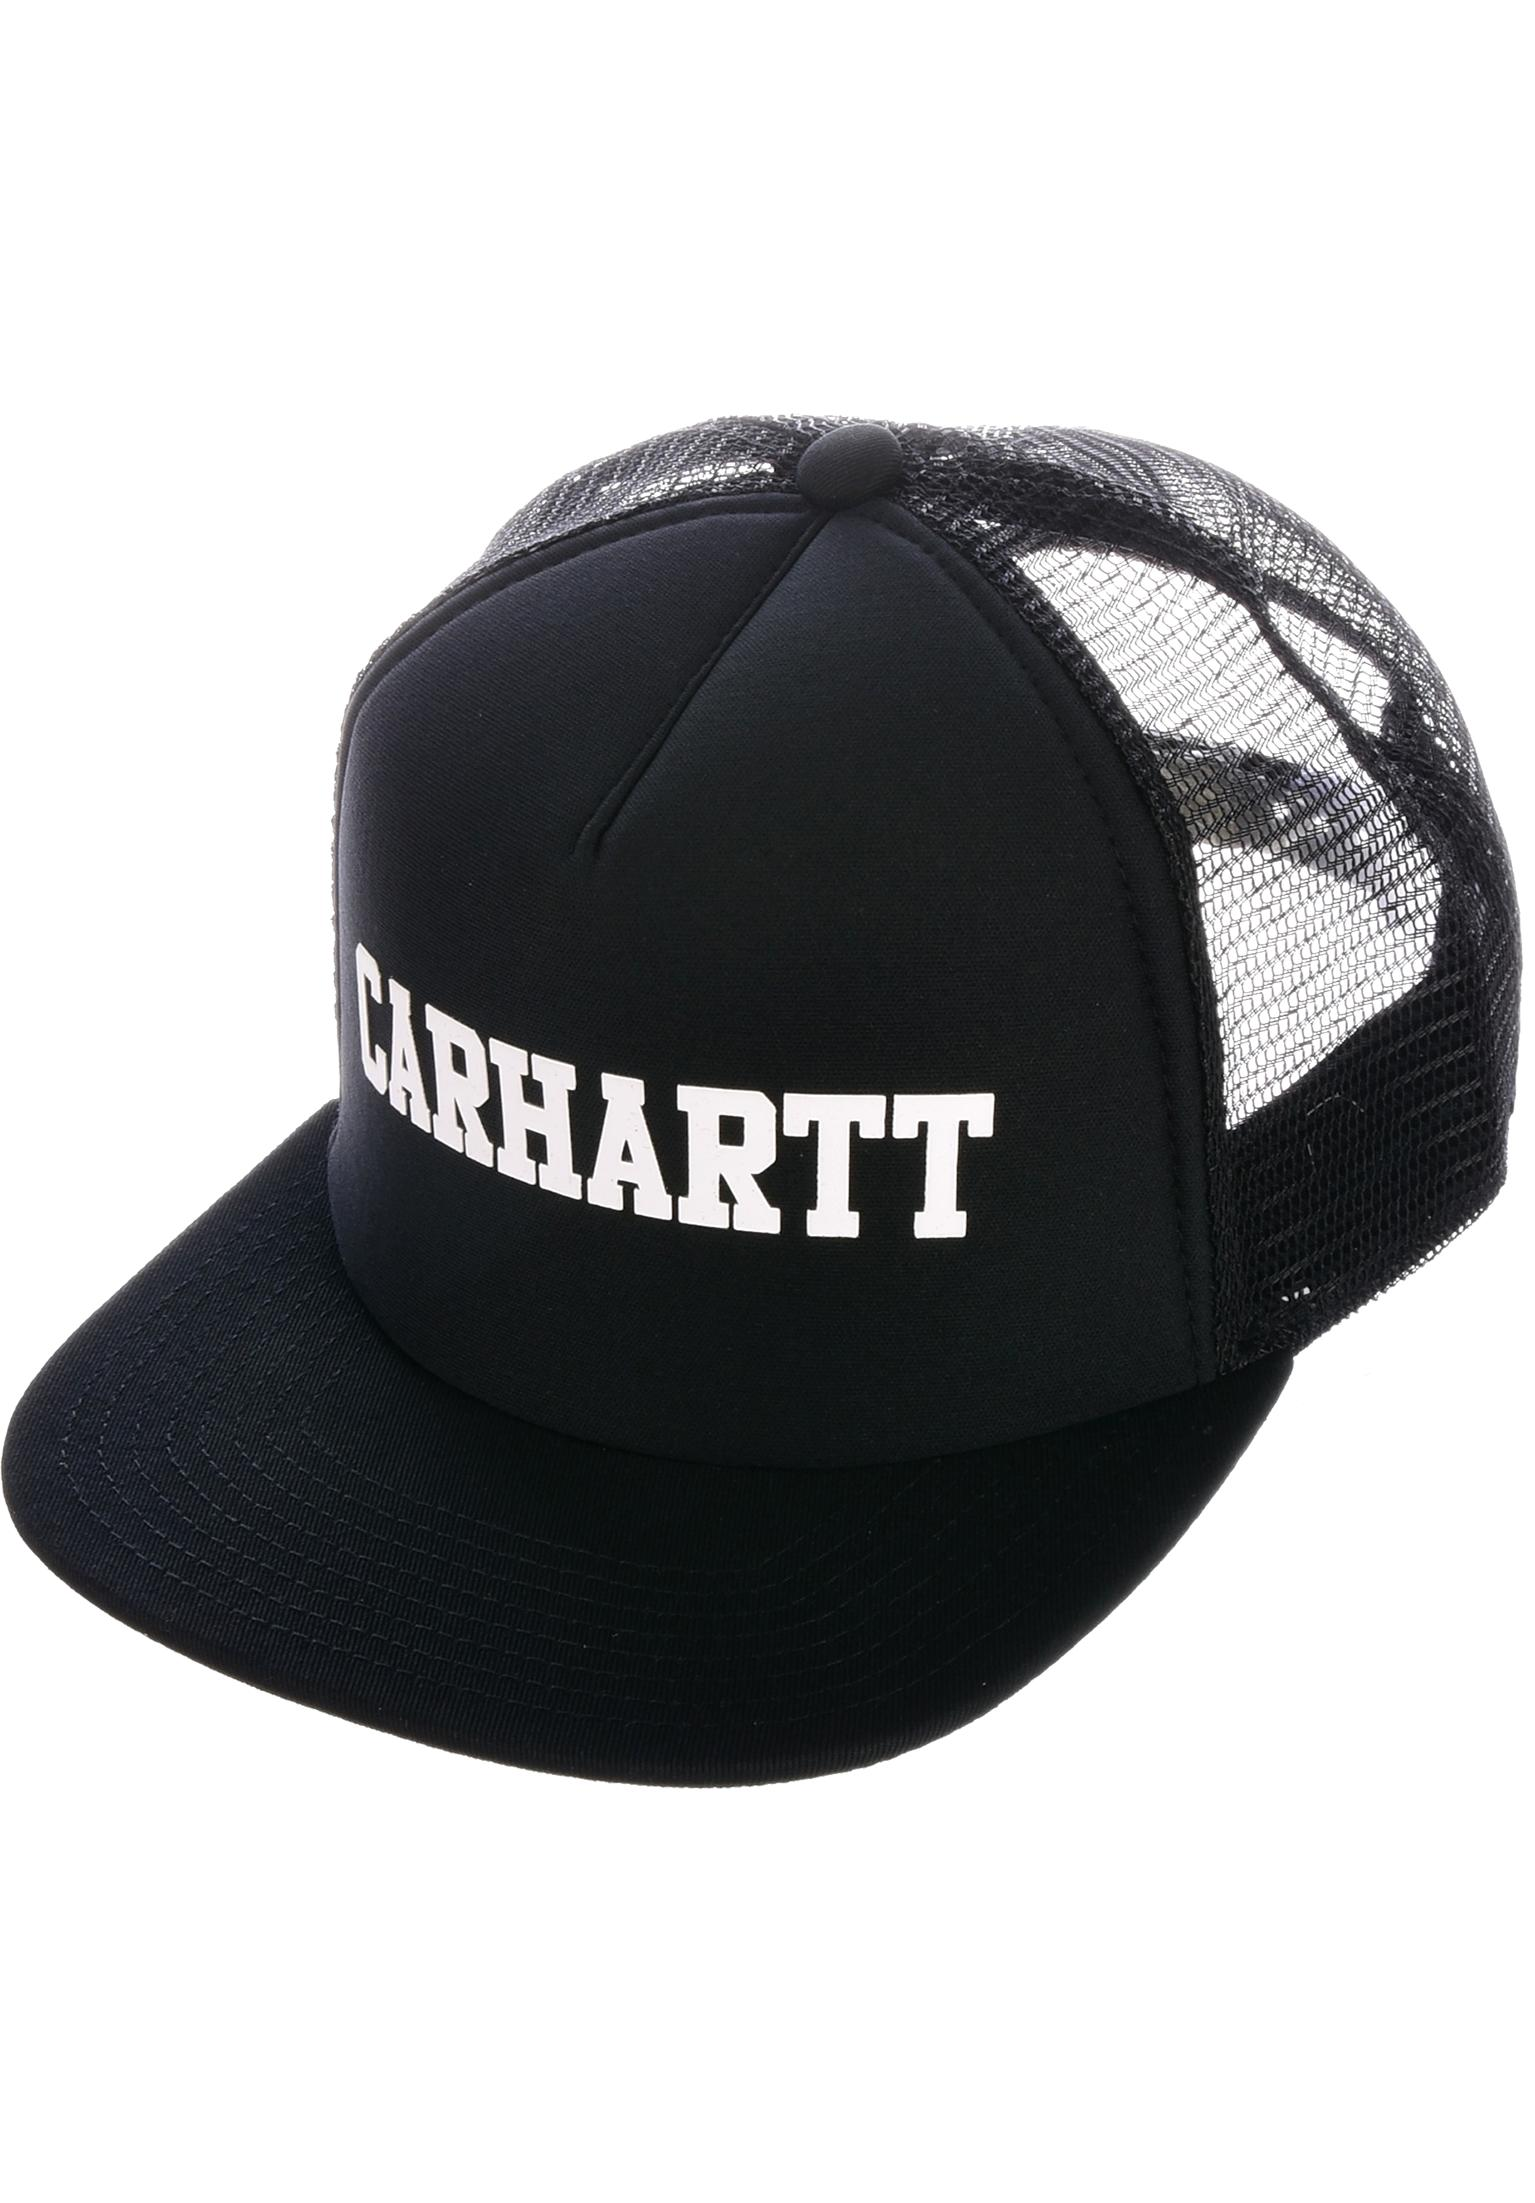 5d62bead72b09 College Trucker Carhartt WIP Caps in black-white for Men | Titus